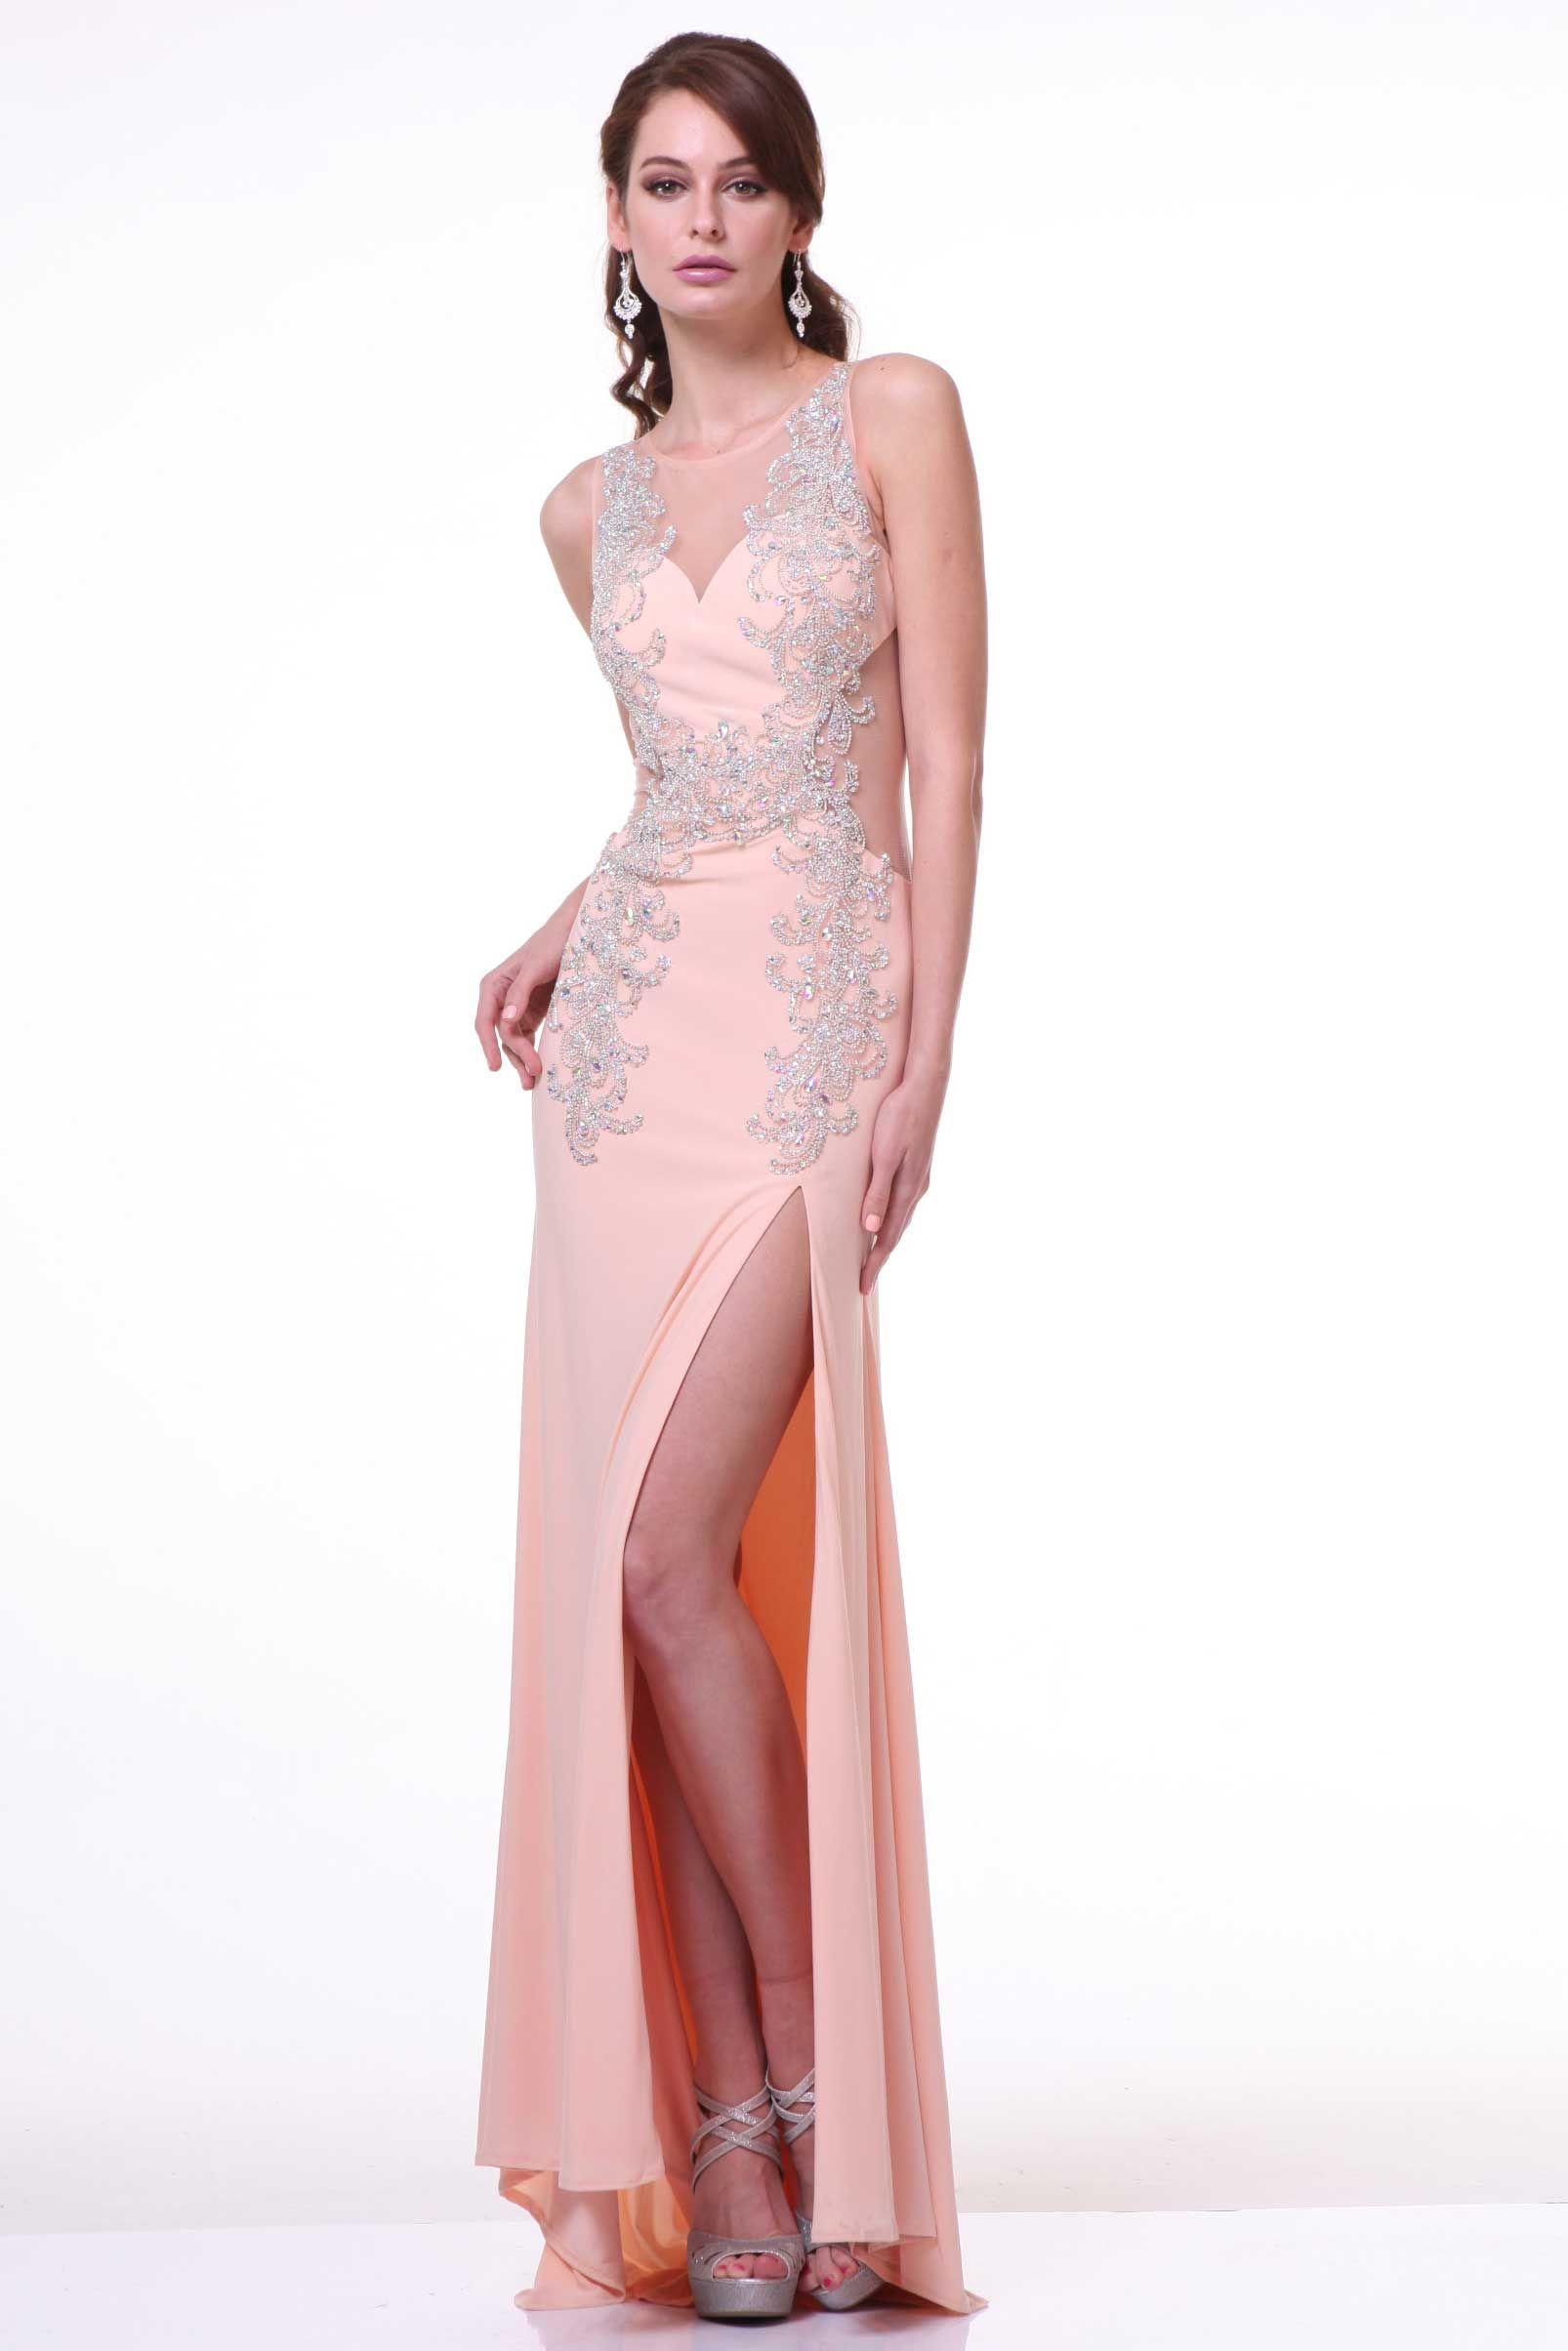 Evening dress with illusion back cd floor length sheath shape